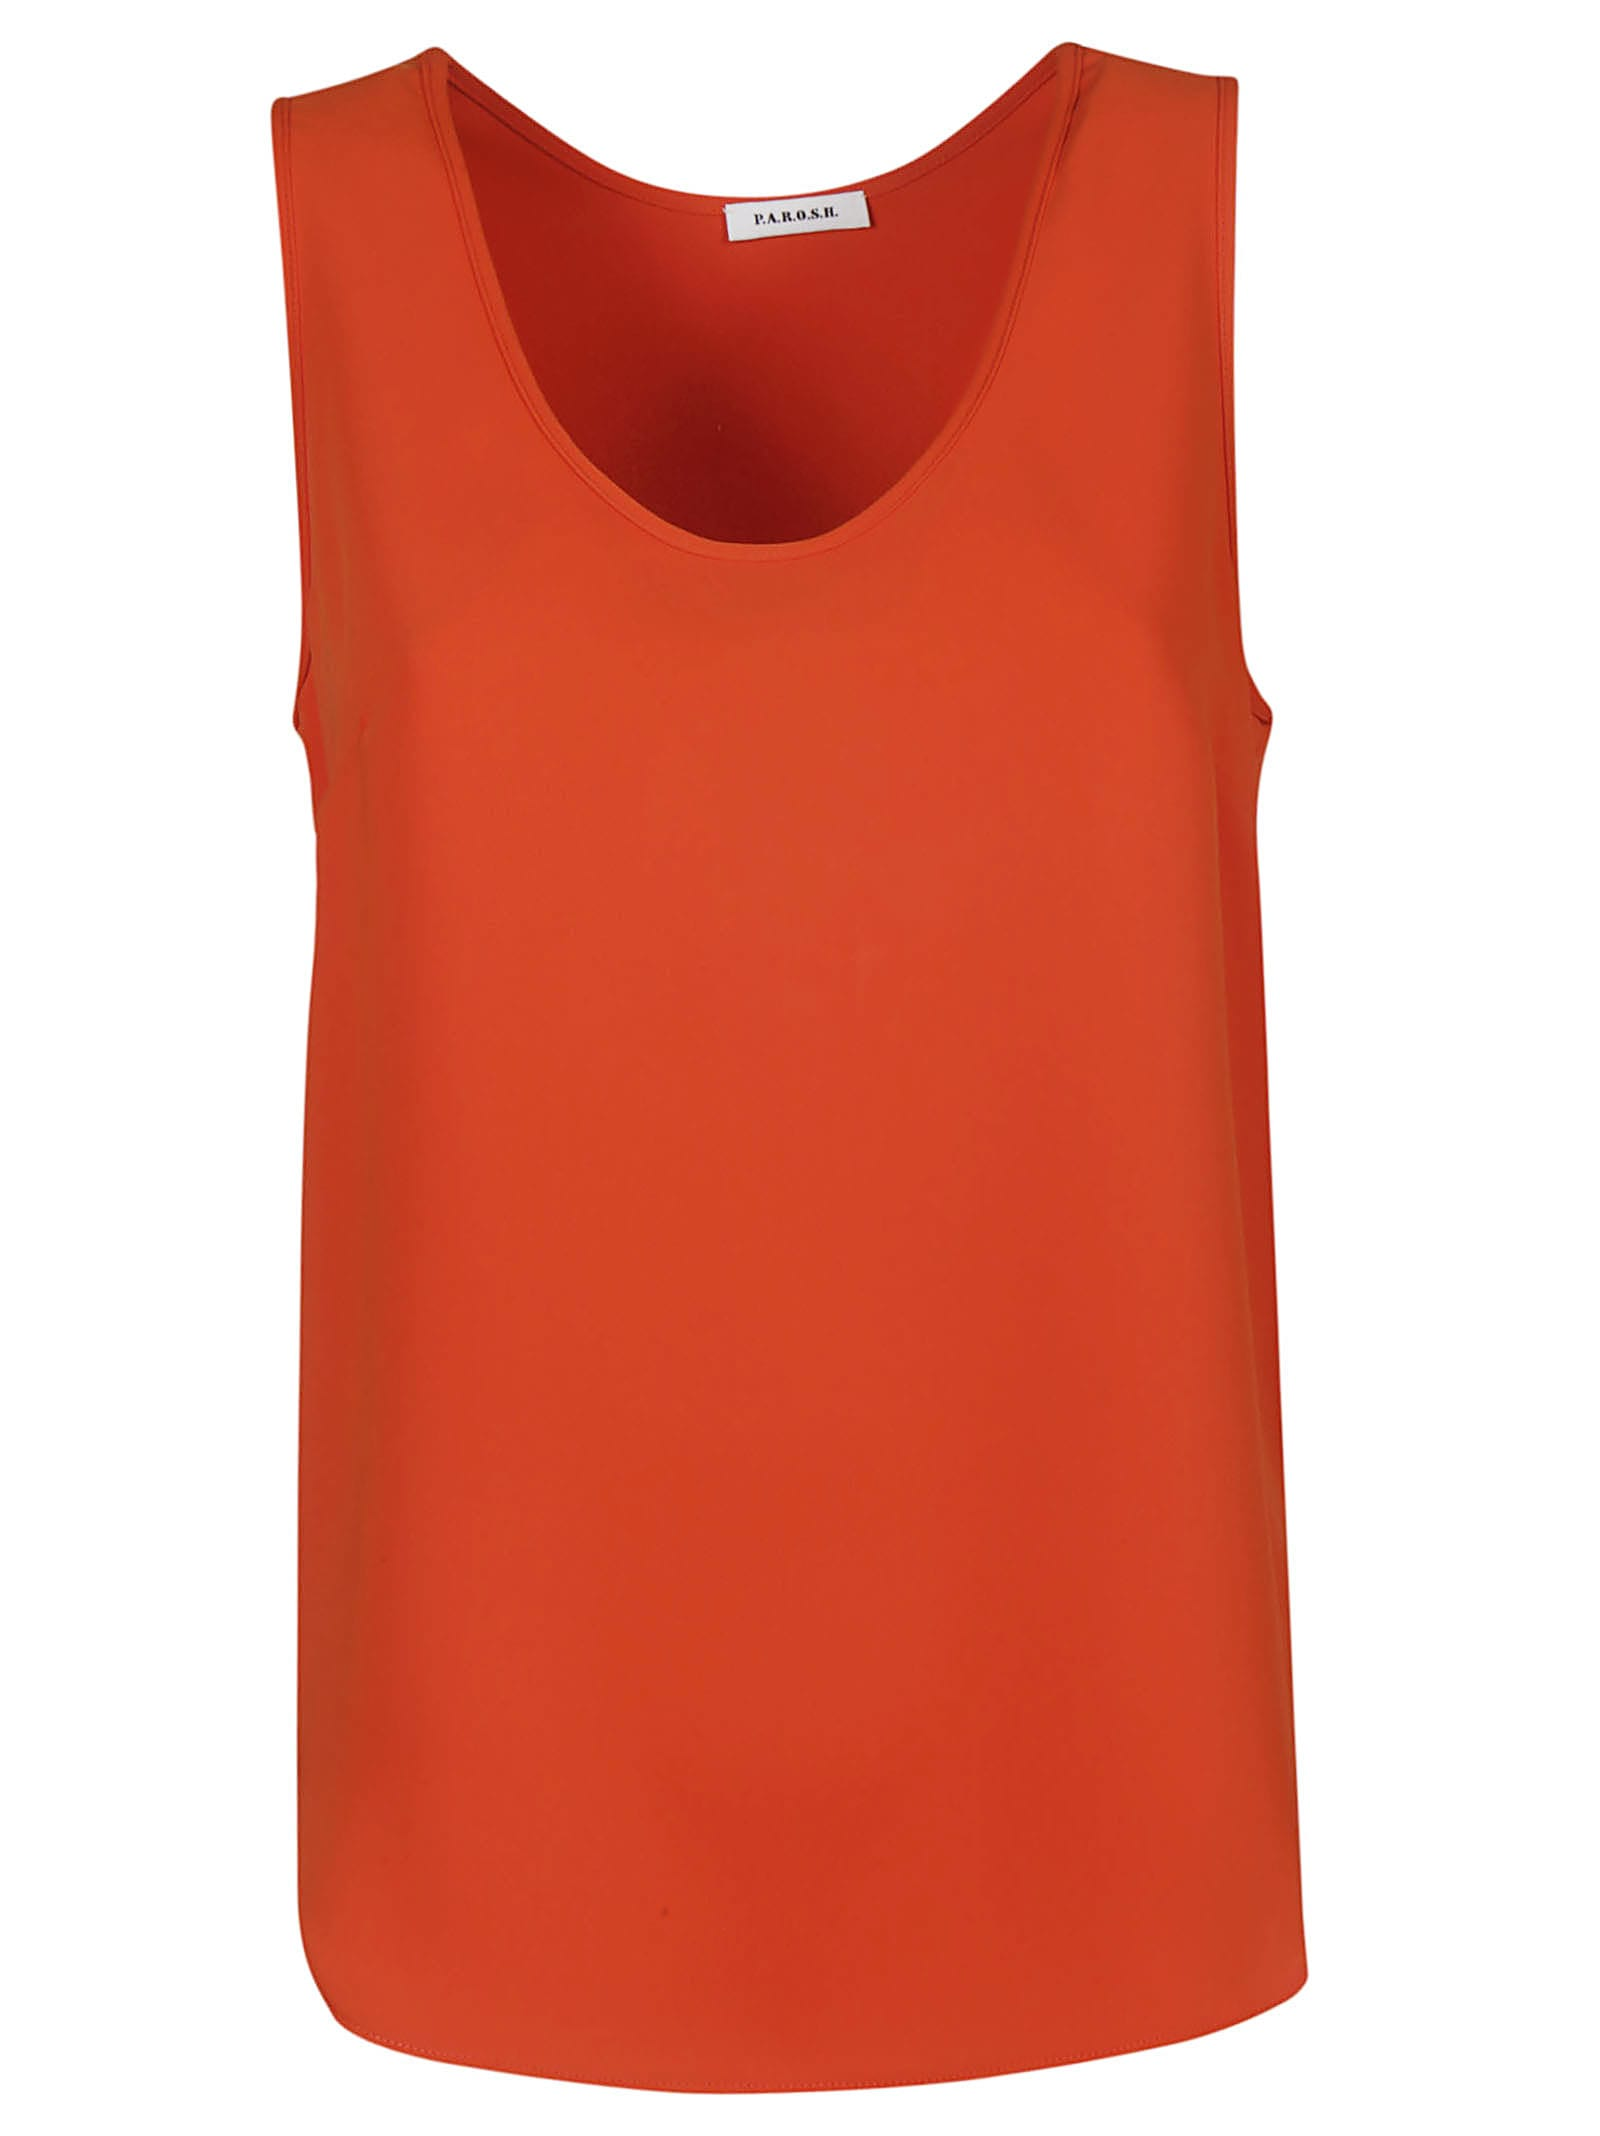 Panterya Tank Top from Parosh: Orange Panterya Tank Top with sleeveless design, deep neck and straight hem.